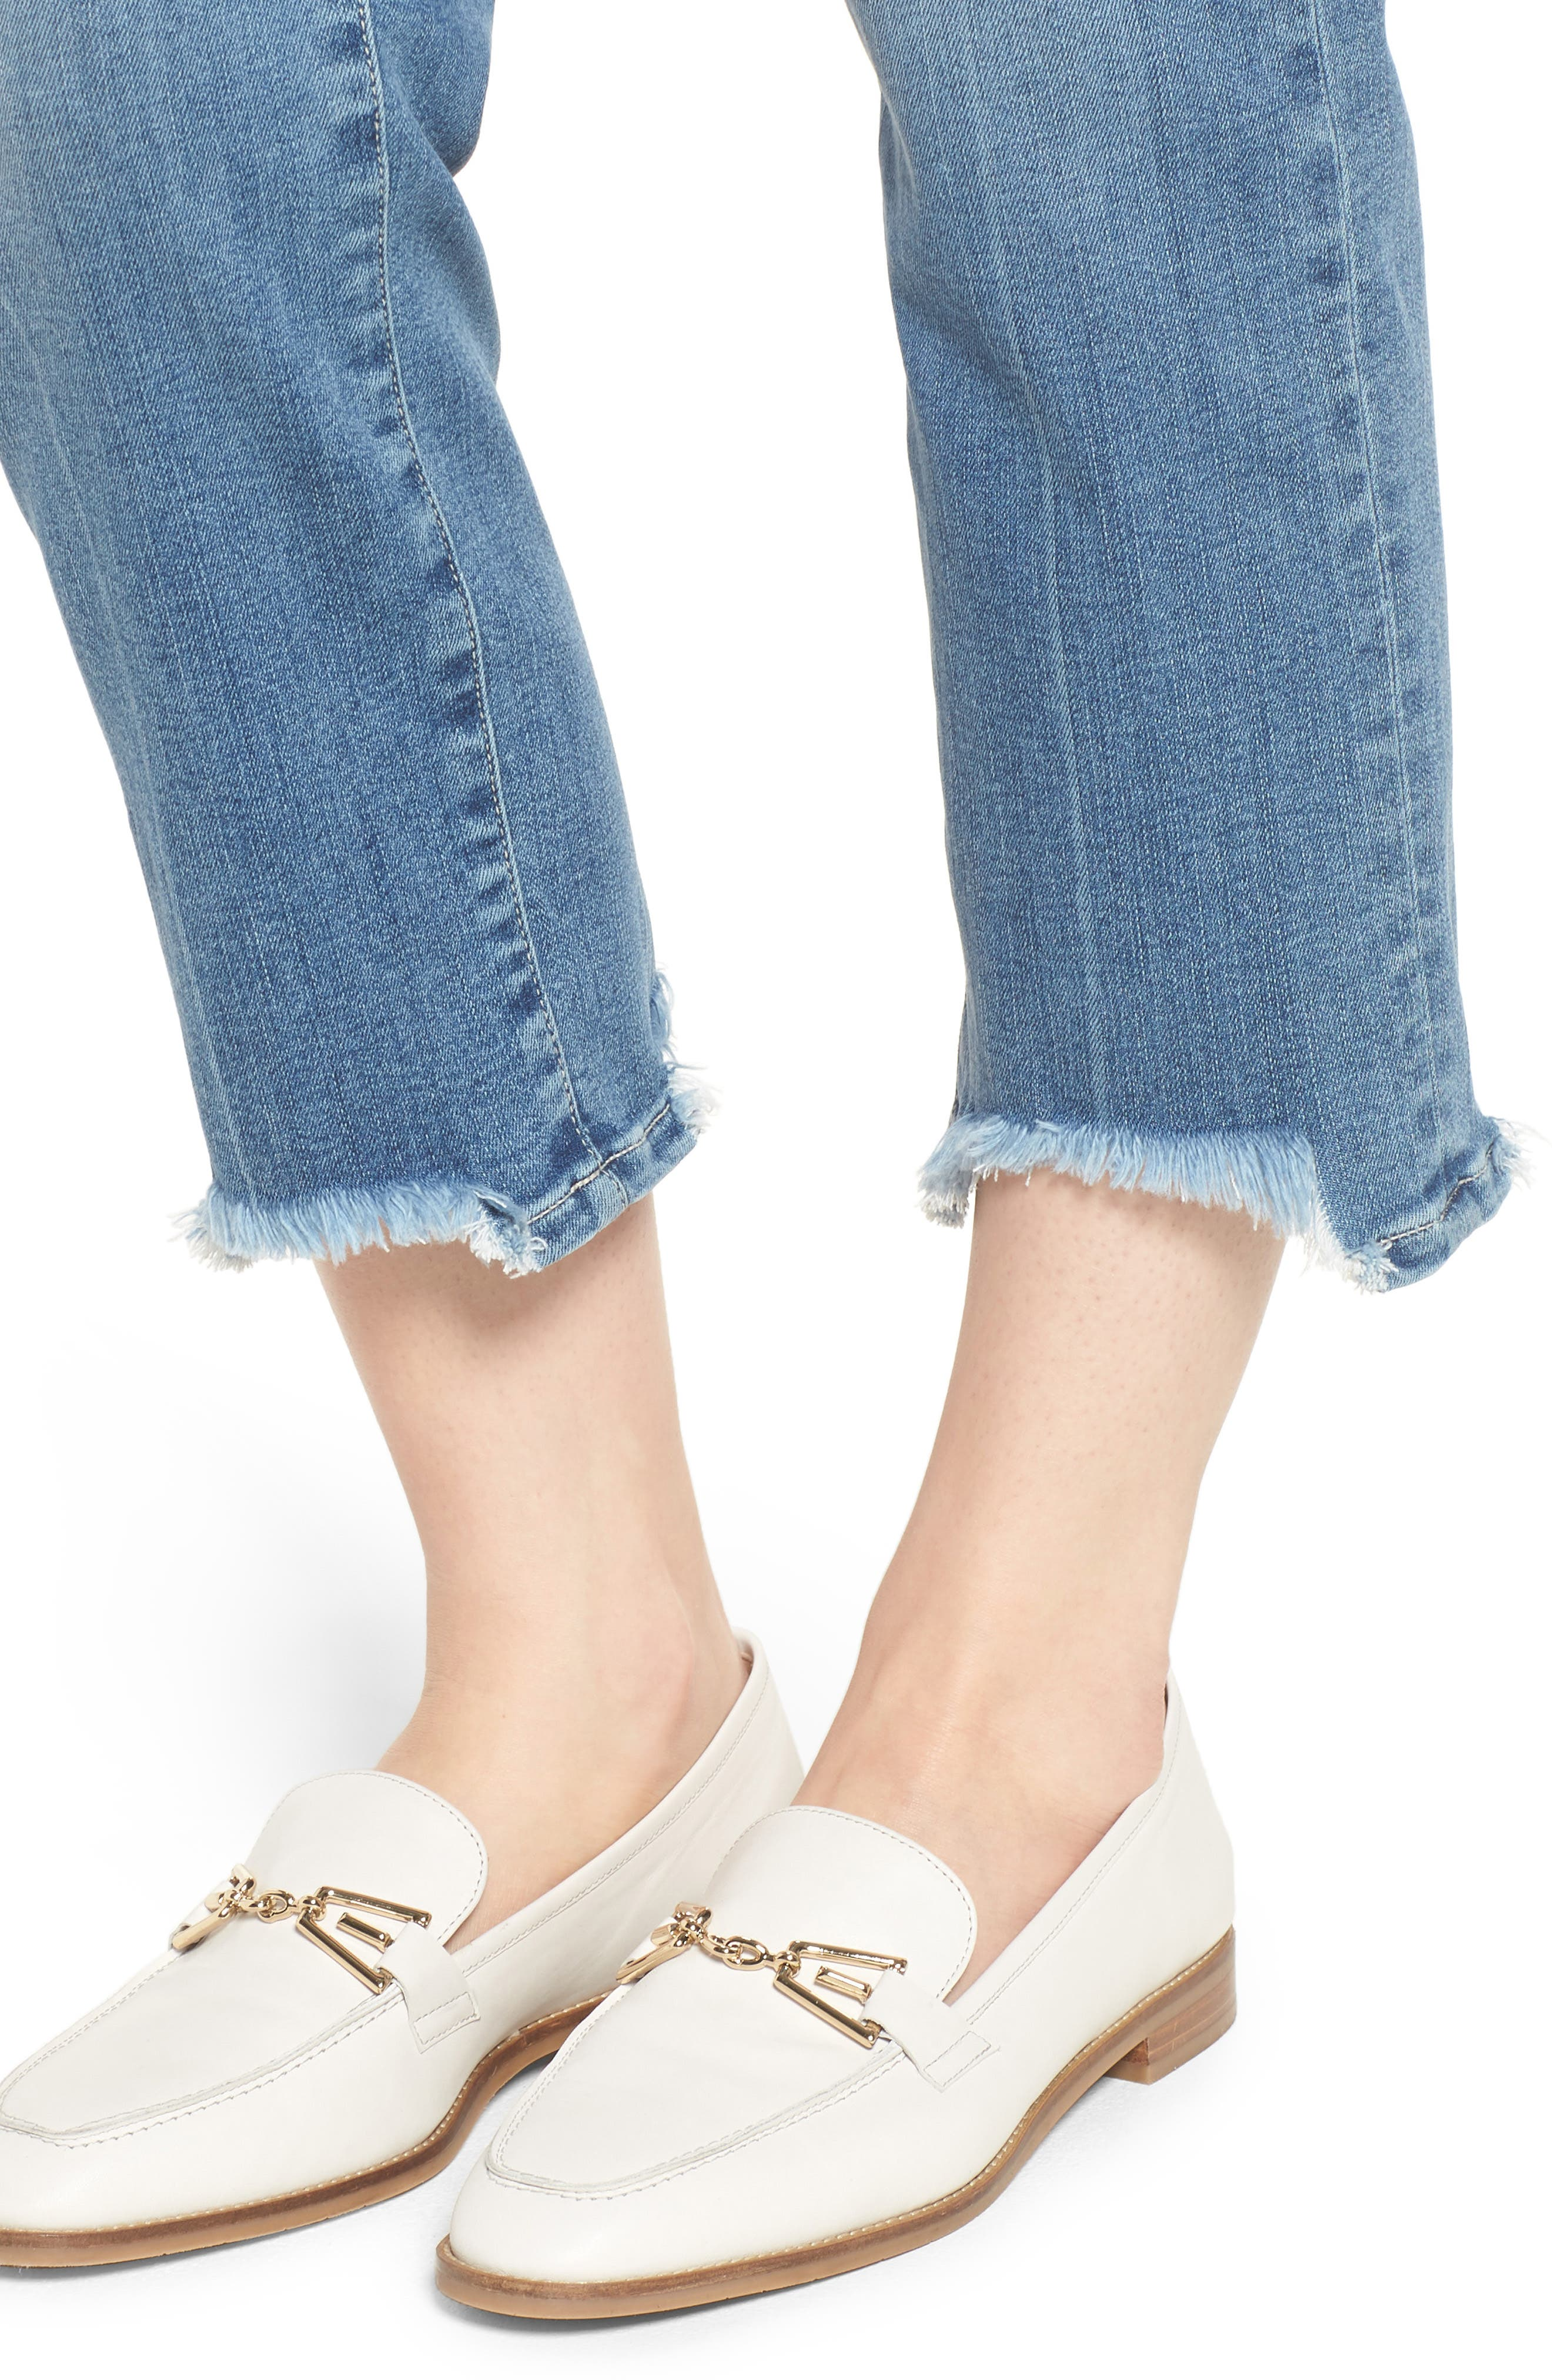 Transcend Vintage - Hoxton High Waist Crop Straight Leg Jeans,                             Alternate thumbnail 4, color,                             Zahara